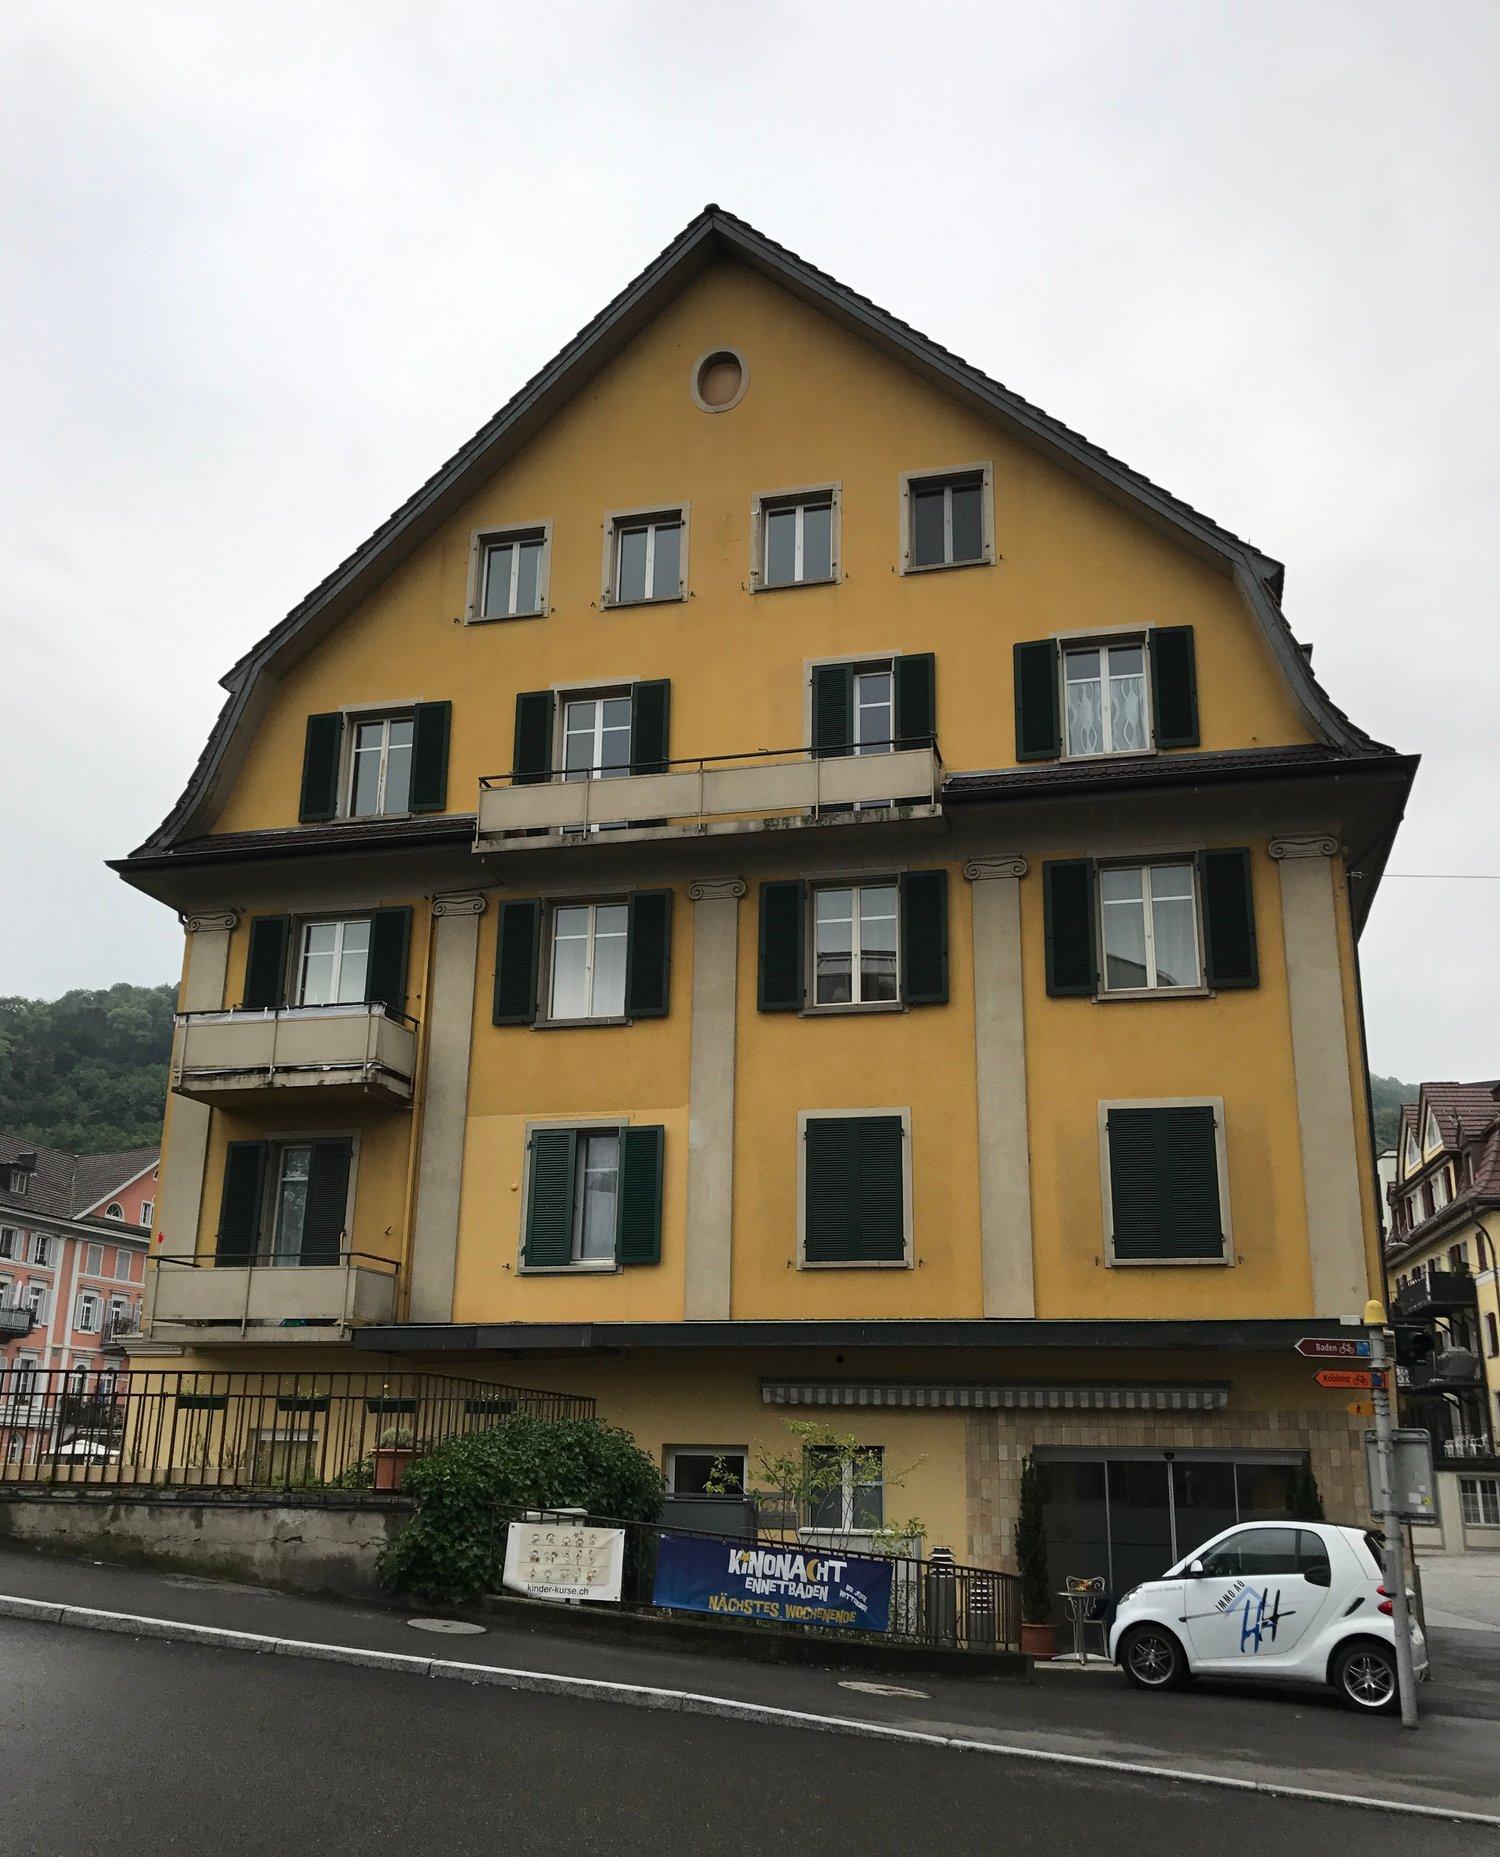 Badstrasse 1